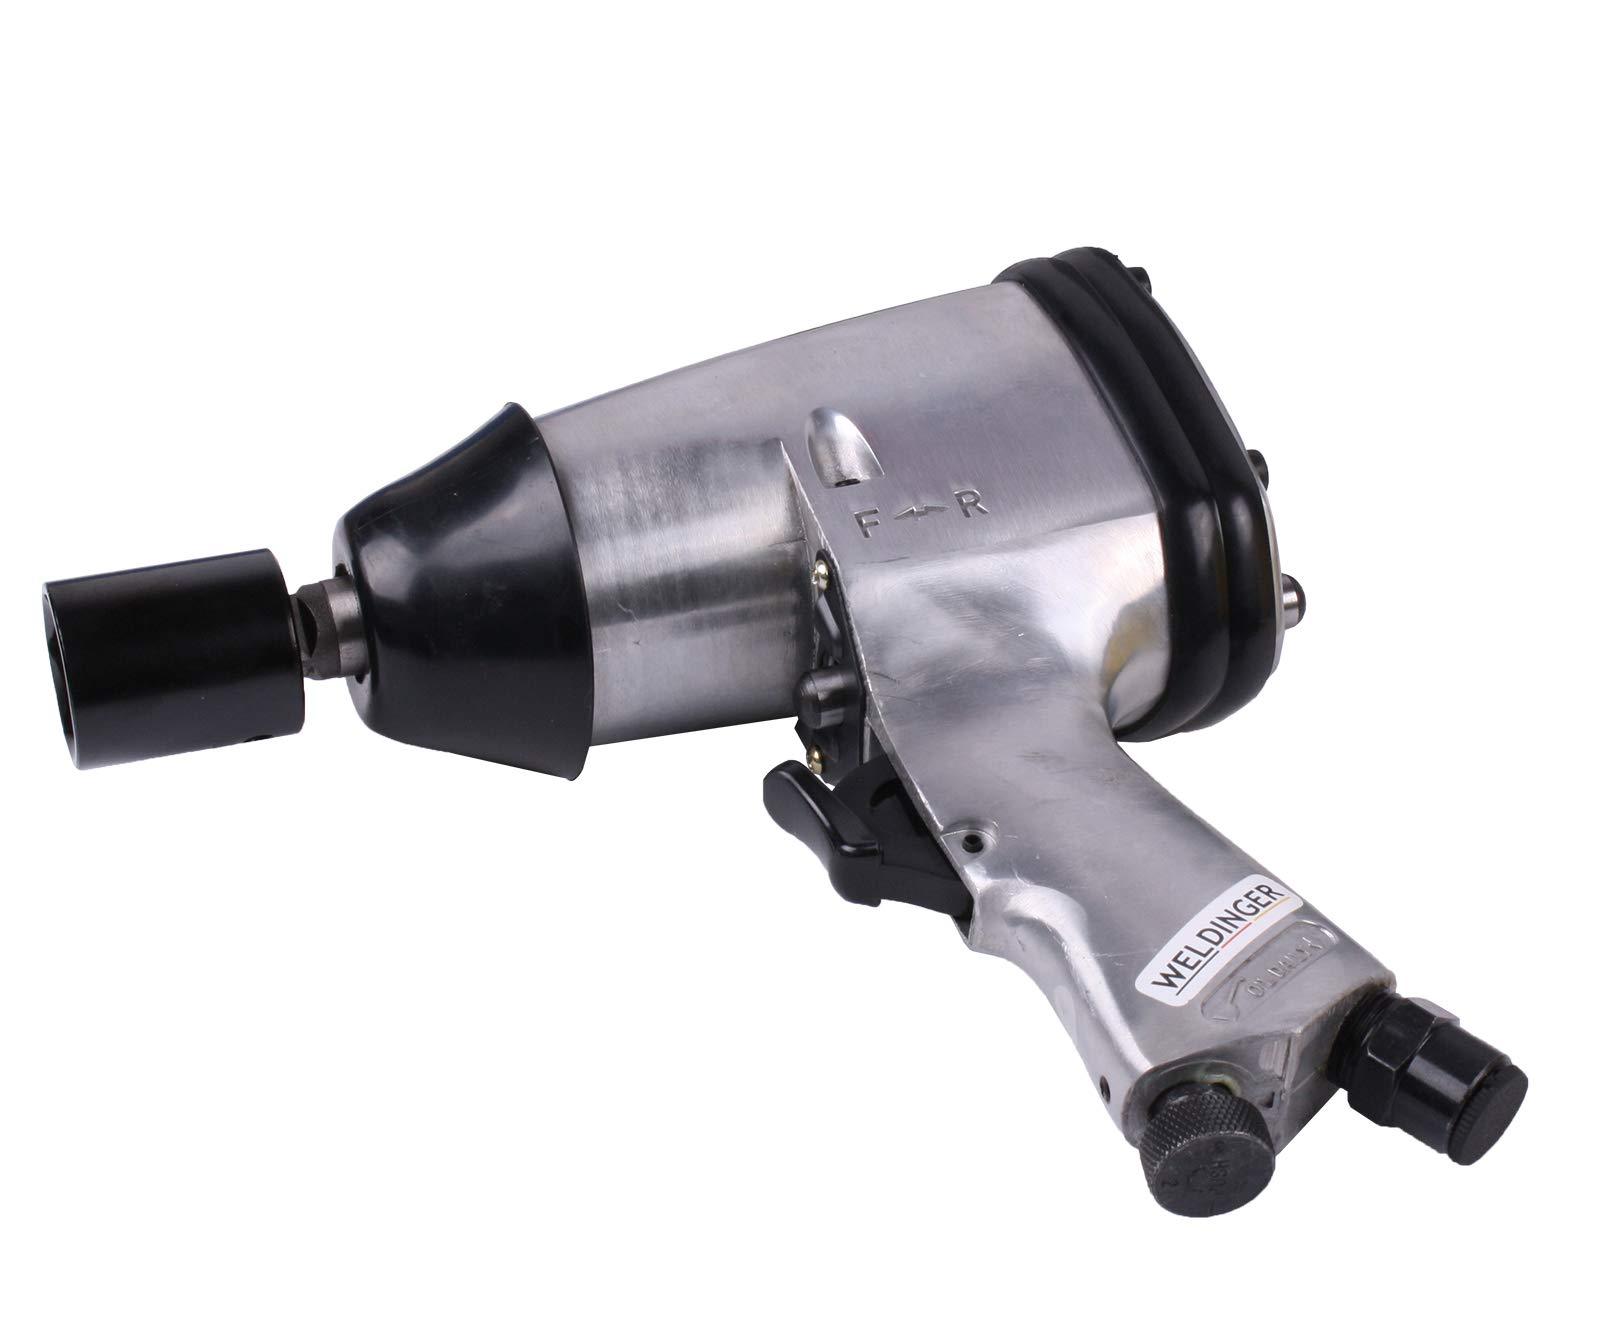 WELDINGER Druckluft-Schlagschrauber 16-teiliges Set (Schlagkraft 312 Nm Luftverbrauch 115 l/min an 6 bar)